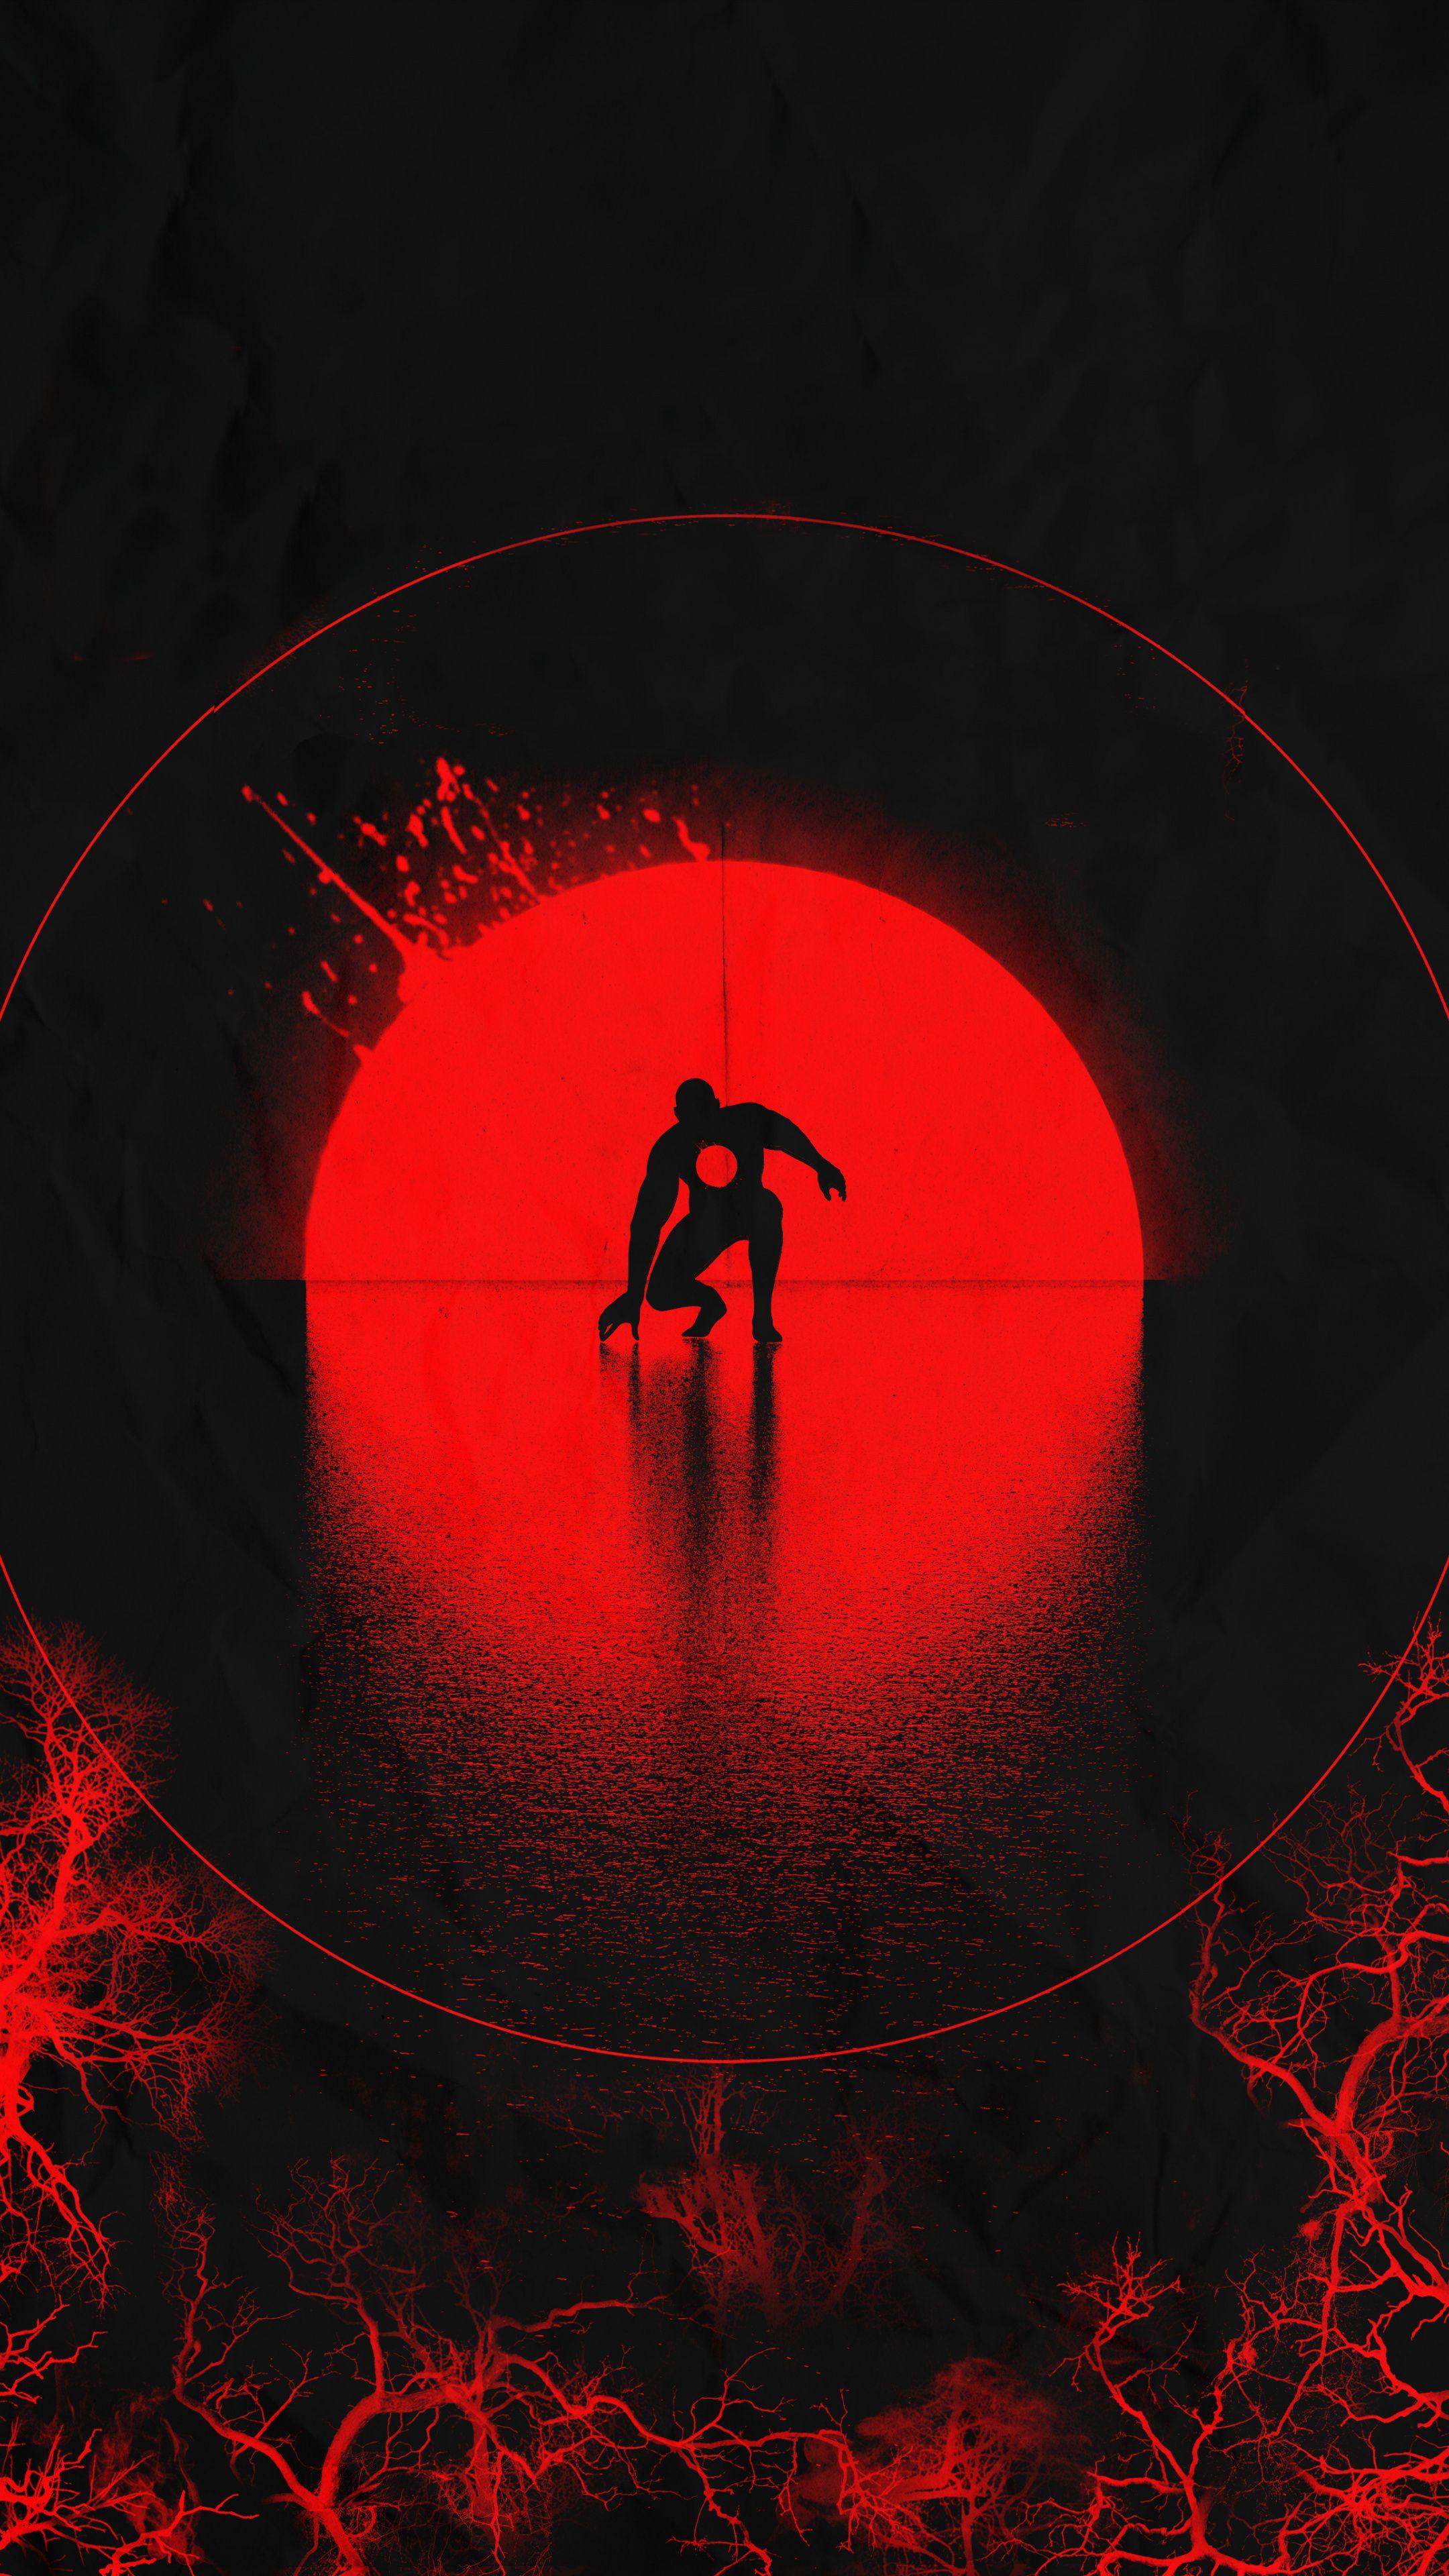 2160x3840 Bloodshot, movie 2020, minimal, art wallpaper in